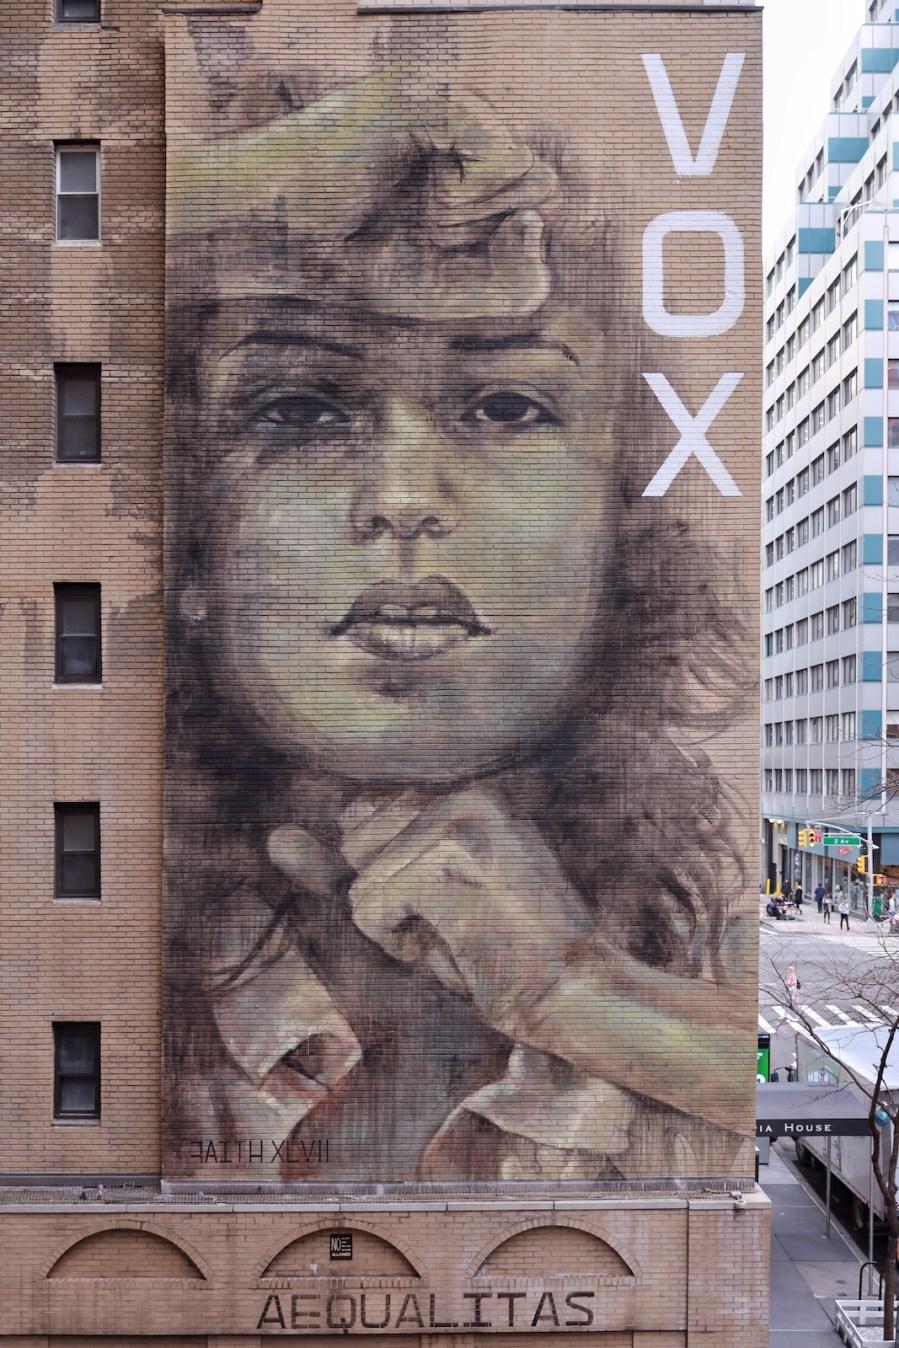 Faith47-Manhattan-New-York-City-ILO100-Art-Walk-street-art-for-mankind-pc-just-a-spectator-5